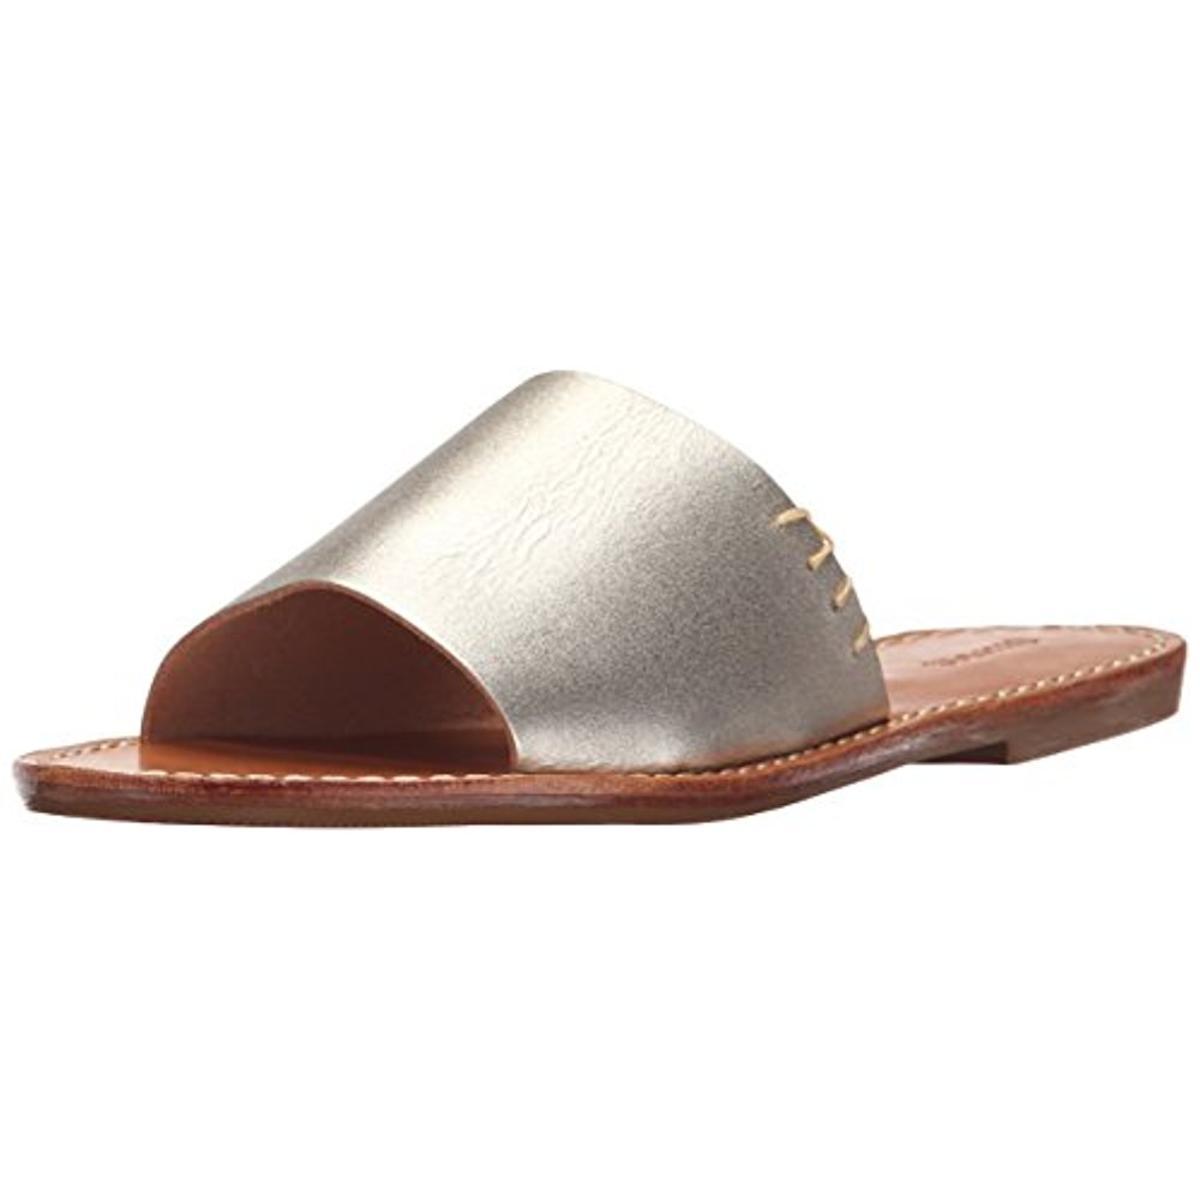 Soludos Womens Leather Shimmer Slide Sandals